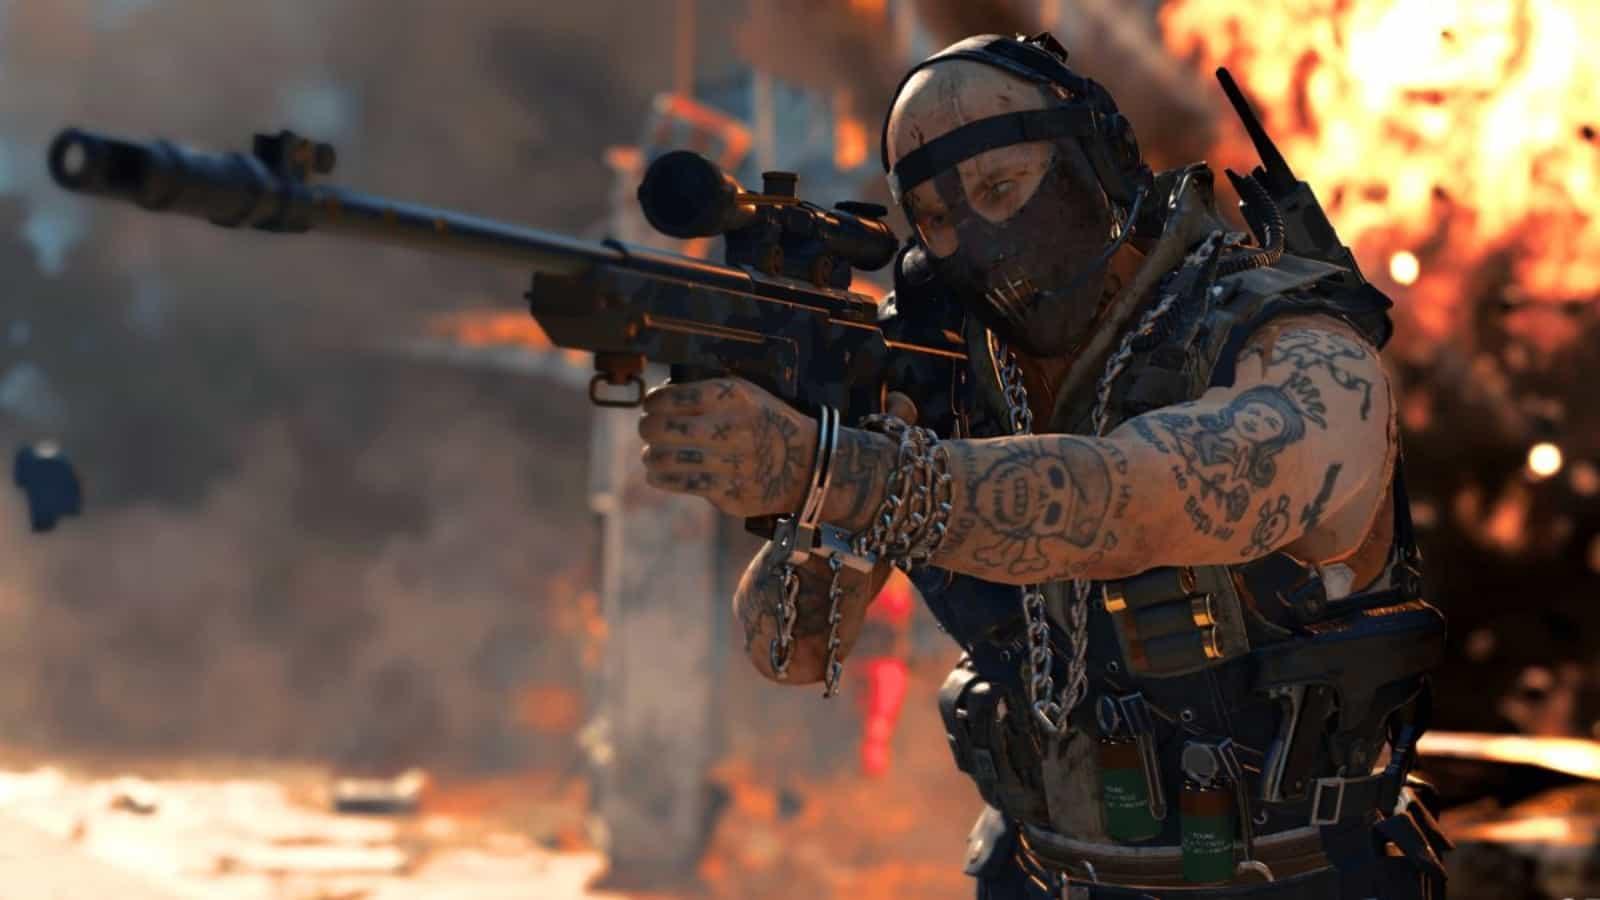 COD Warzone: The Best DMR 14 Warzone Loadout